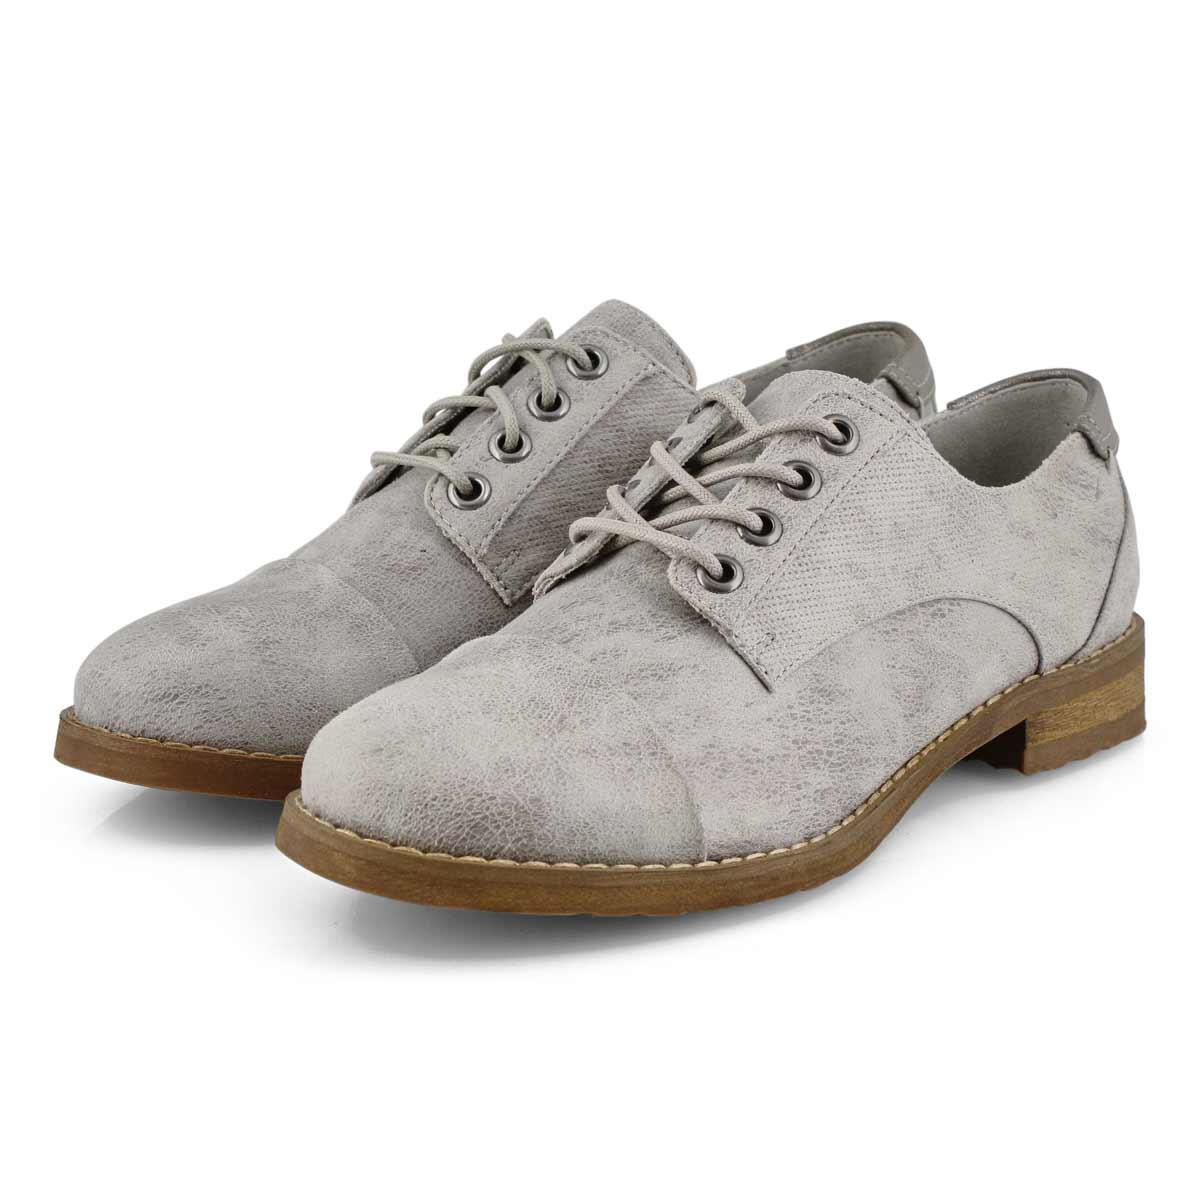 Lds Meghan light grey lace up oxford